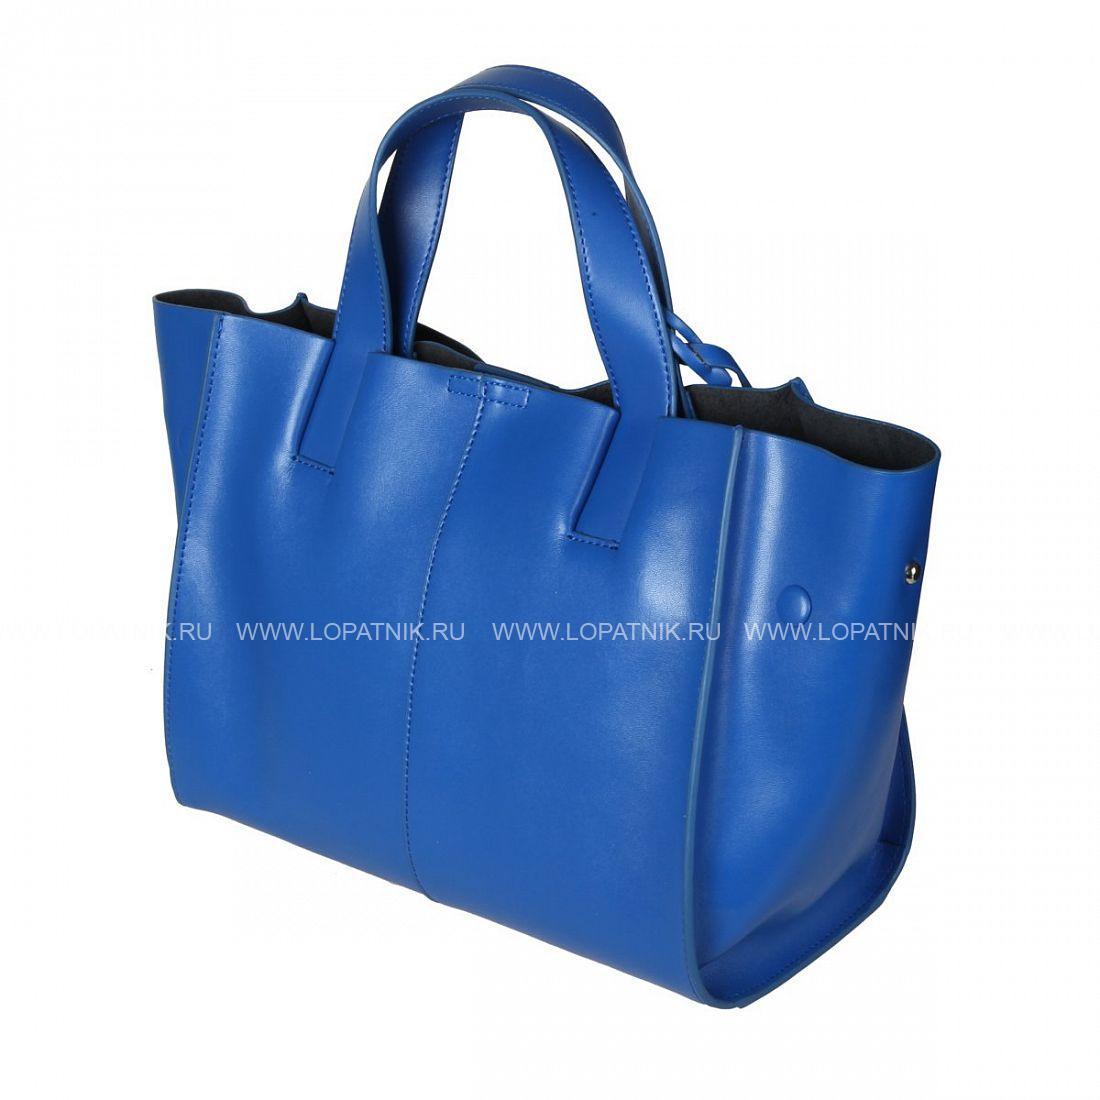 8d189bb9a1bb Сумка кожаная женская Sergio Belotti 28 blue, Синий цена 8 900 руб ...